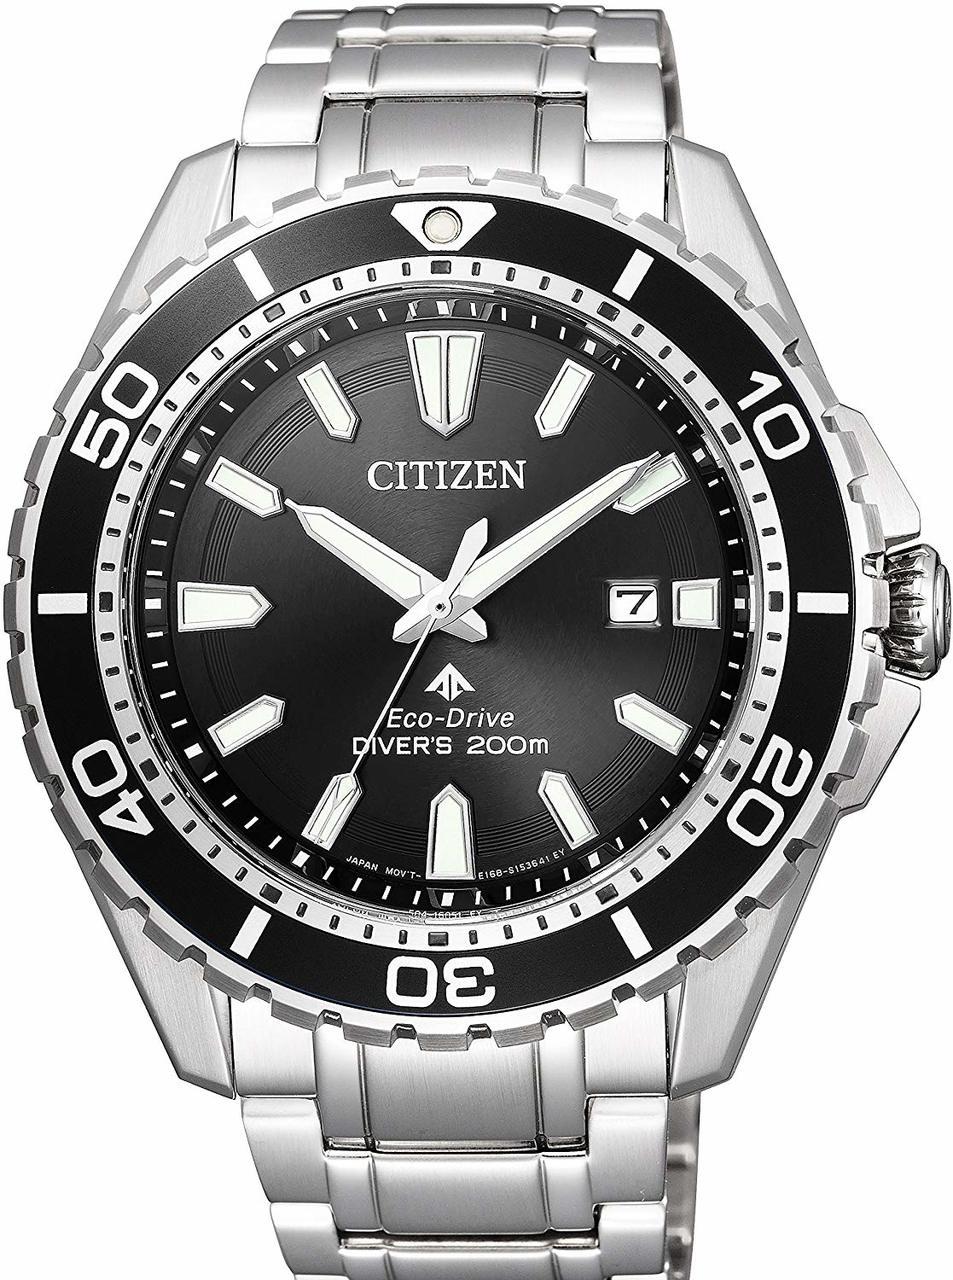 Montre Citizen Promaster Eco-Drive BN0190-82E (dutyfreeislandshop.com)